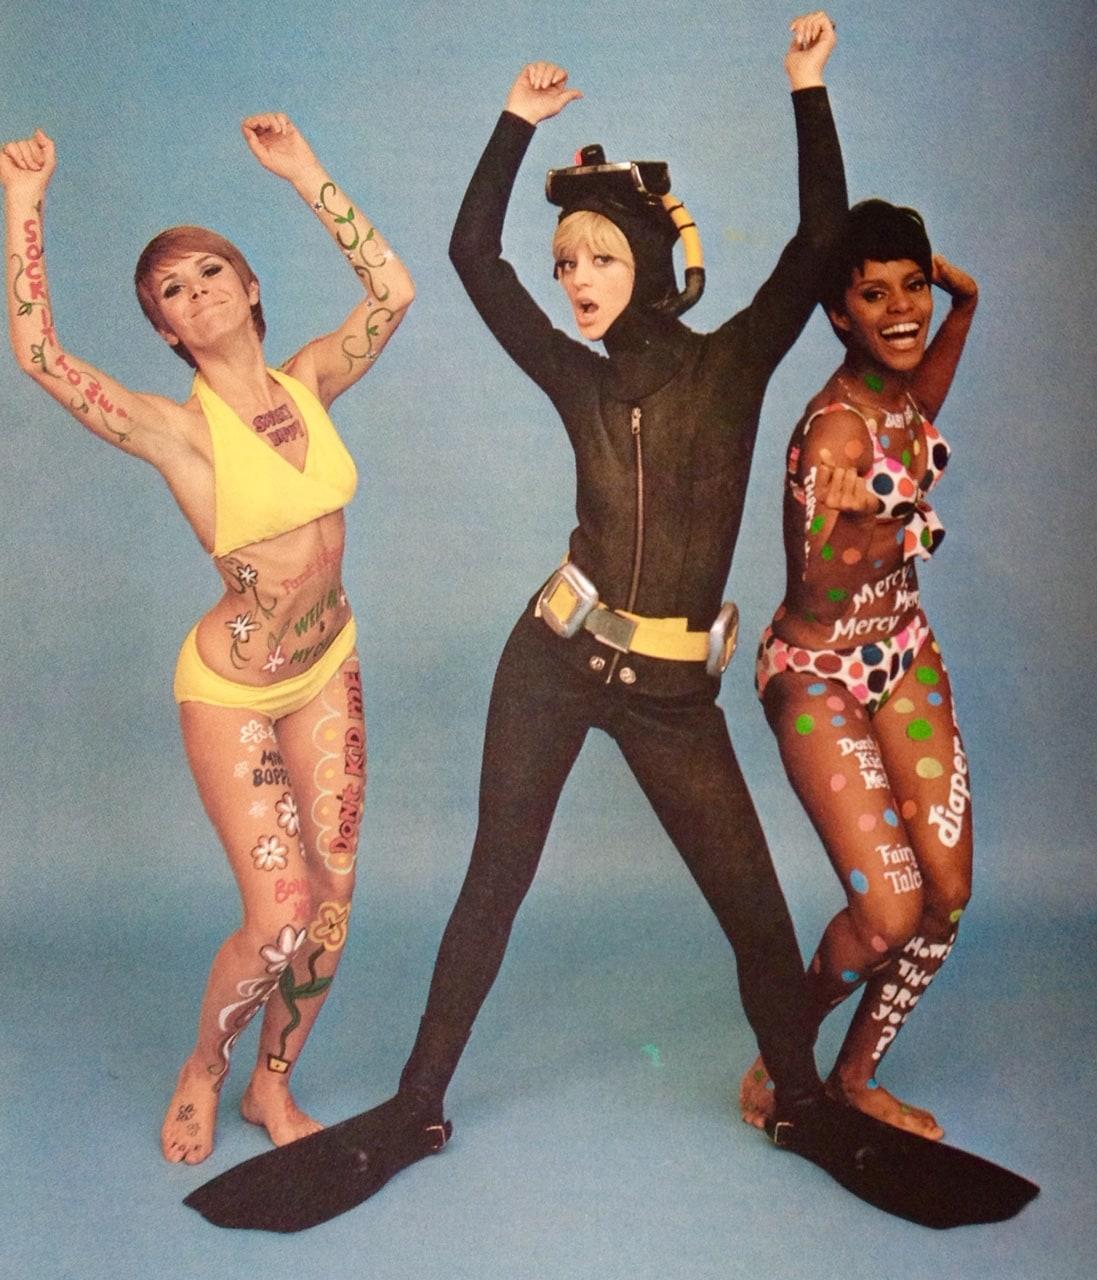 Hannah Spearritt,Anna Marie Gutierrez (b. ?) Erotic pics & movies James Bulliard,Vera Bogetti